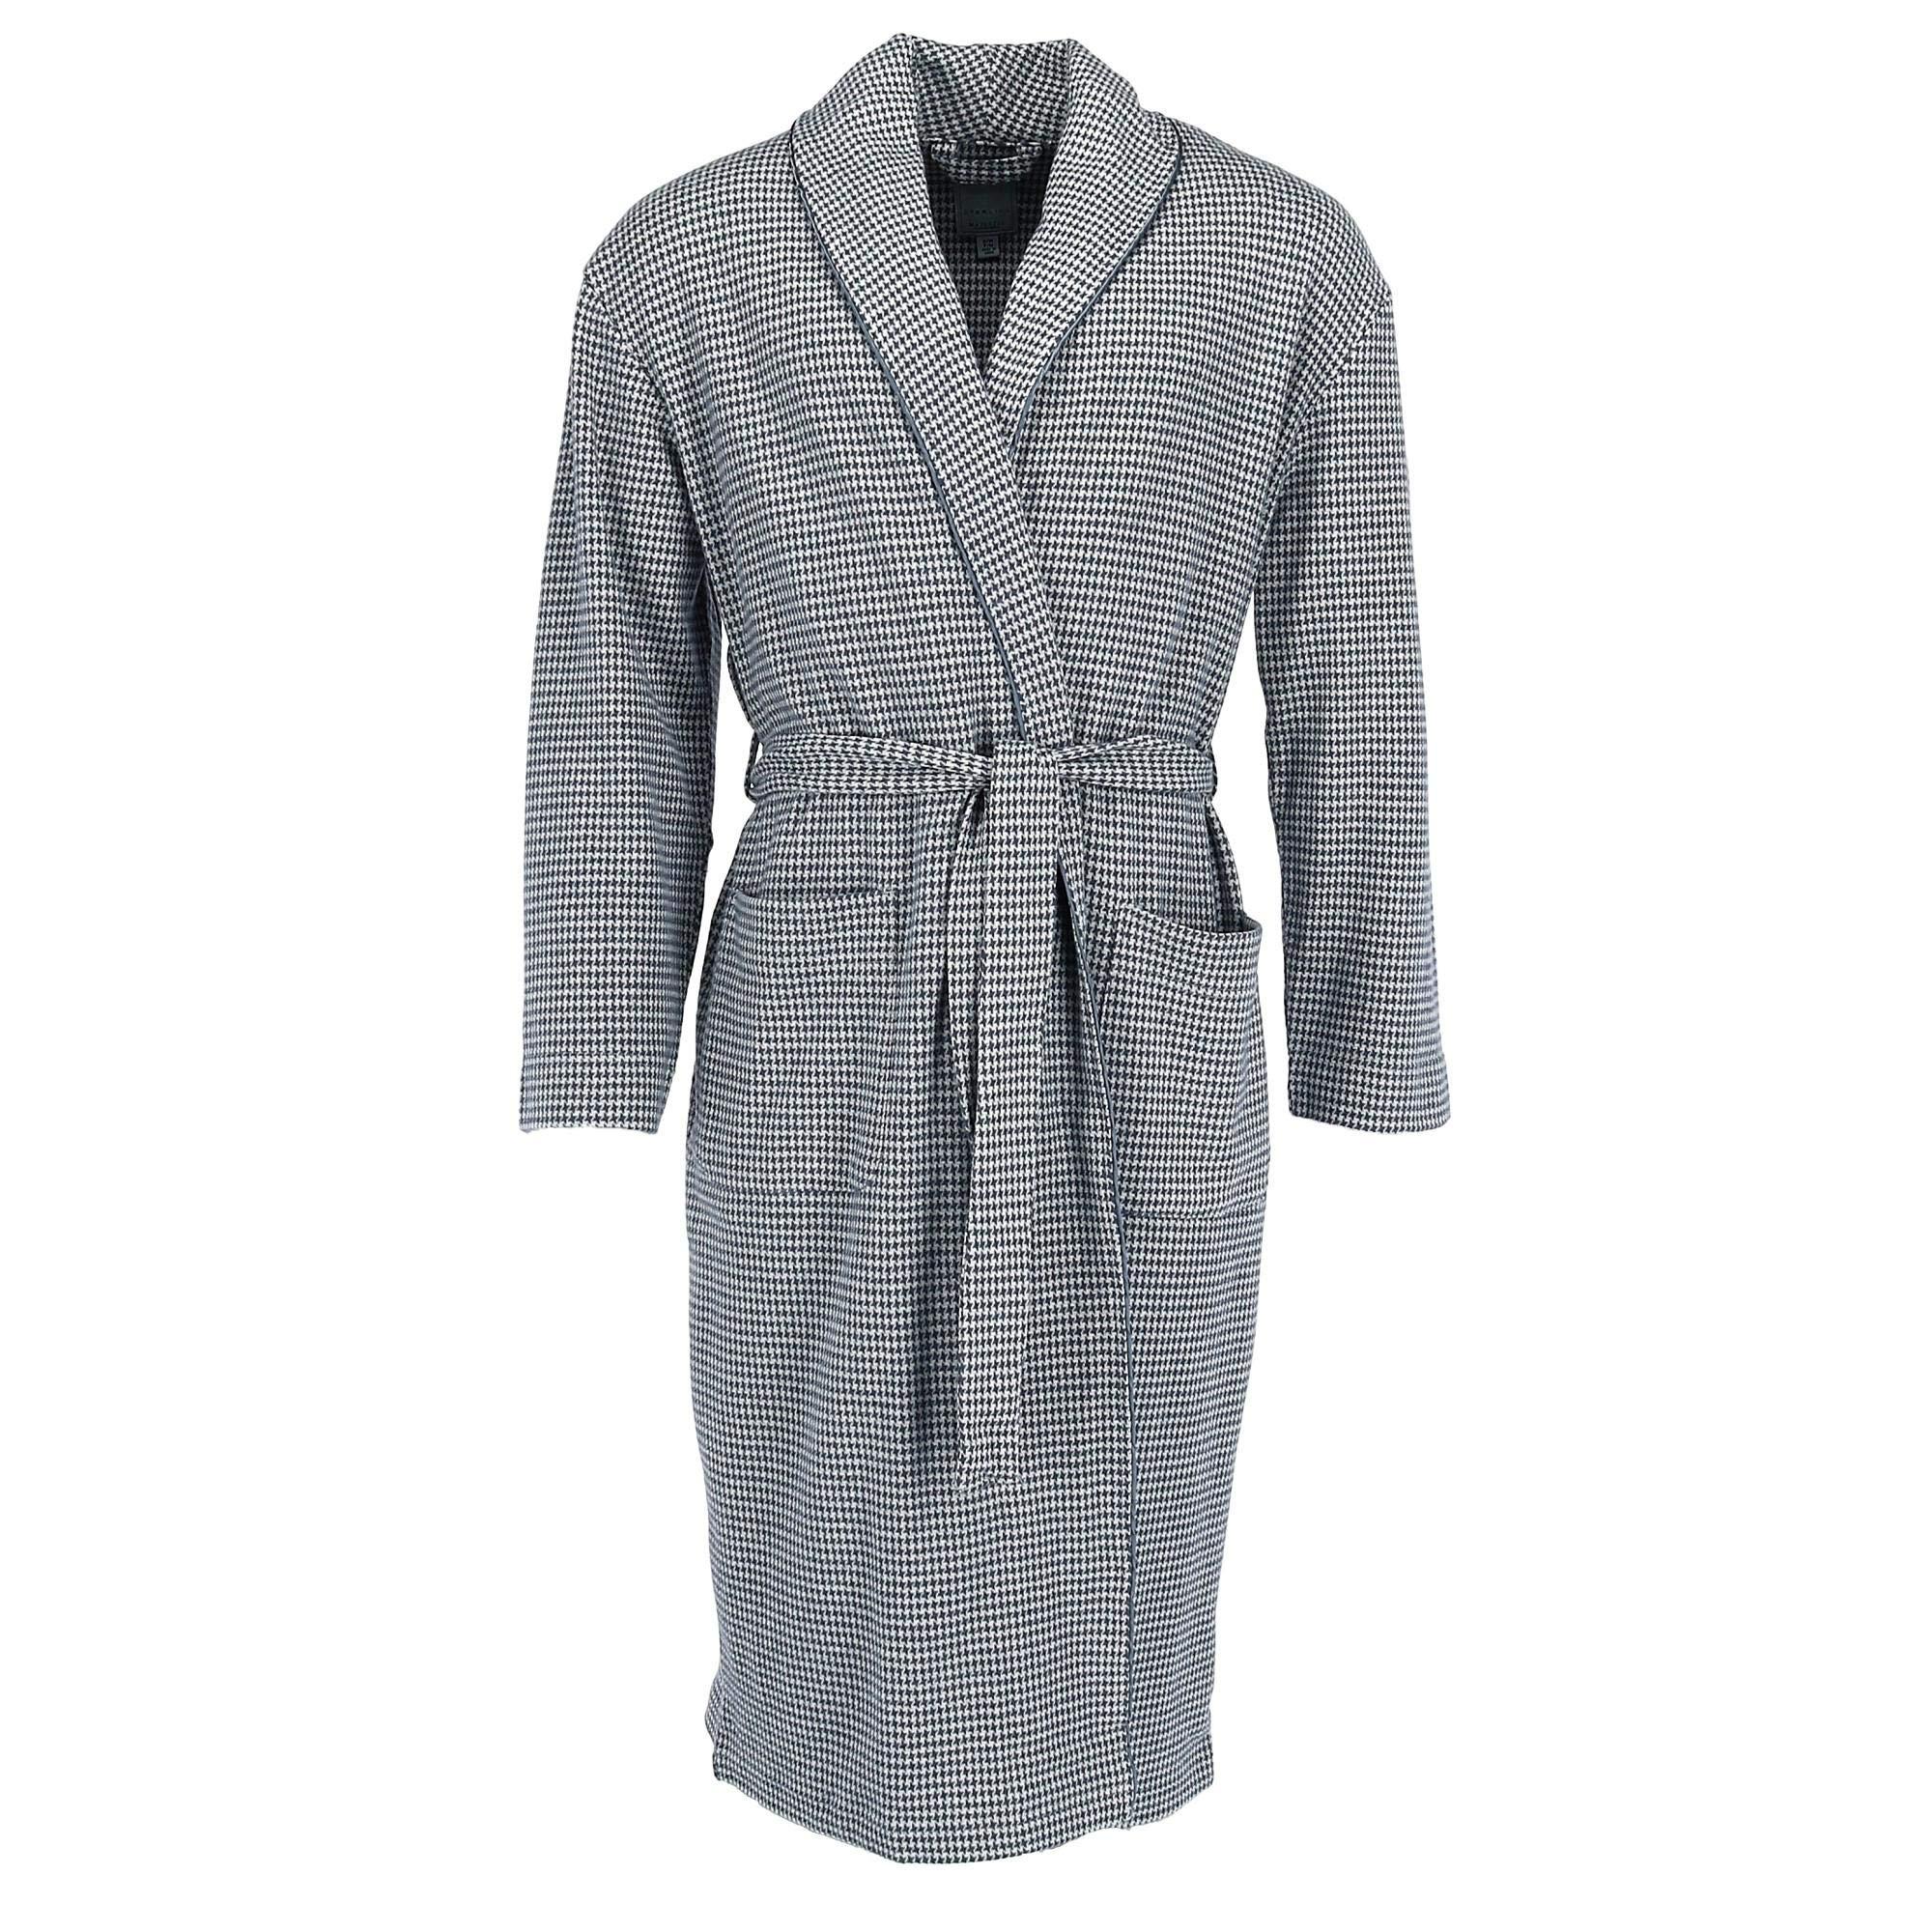 Majestic International Men's Big and Tall Micro Fleece Robe, LT/XLT, Grey